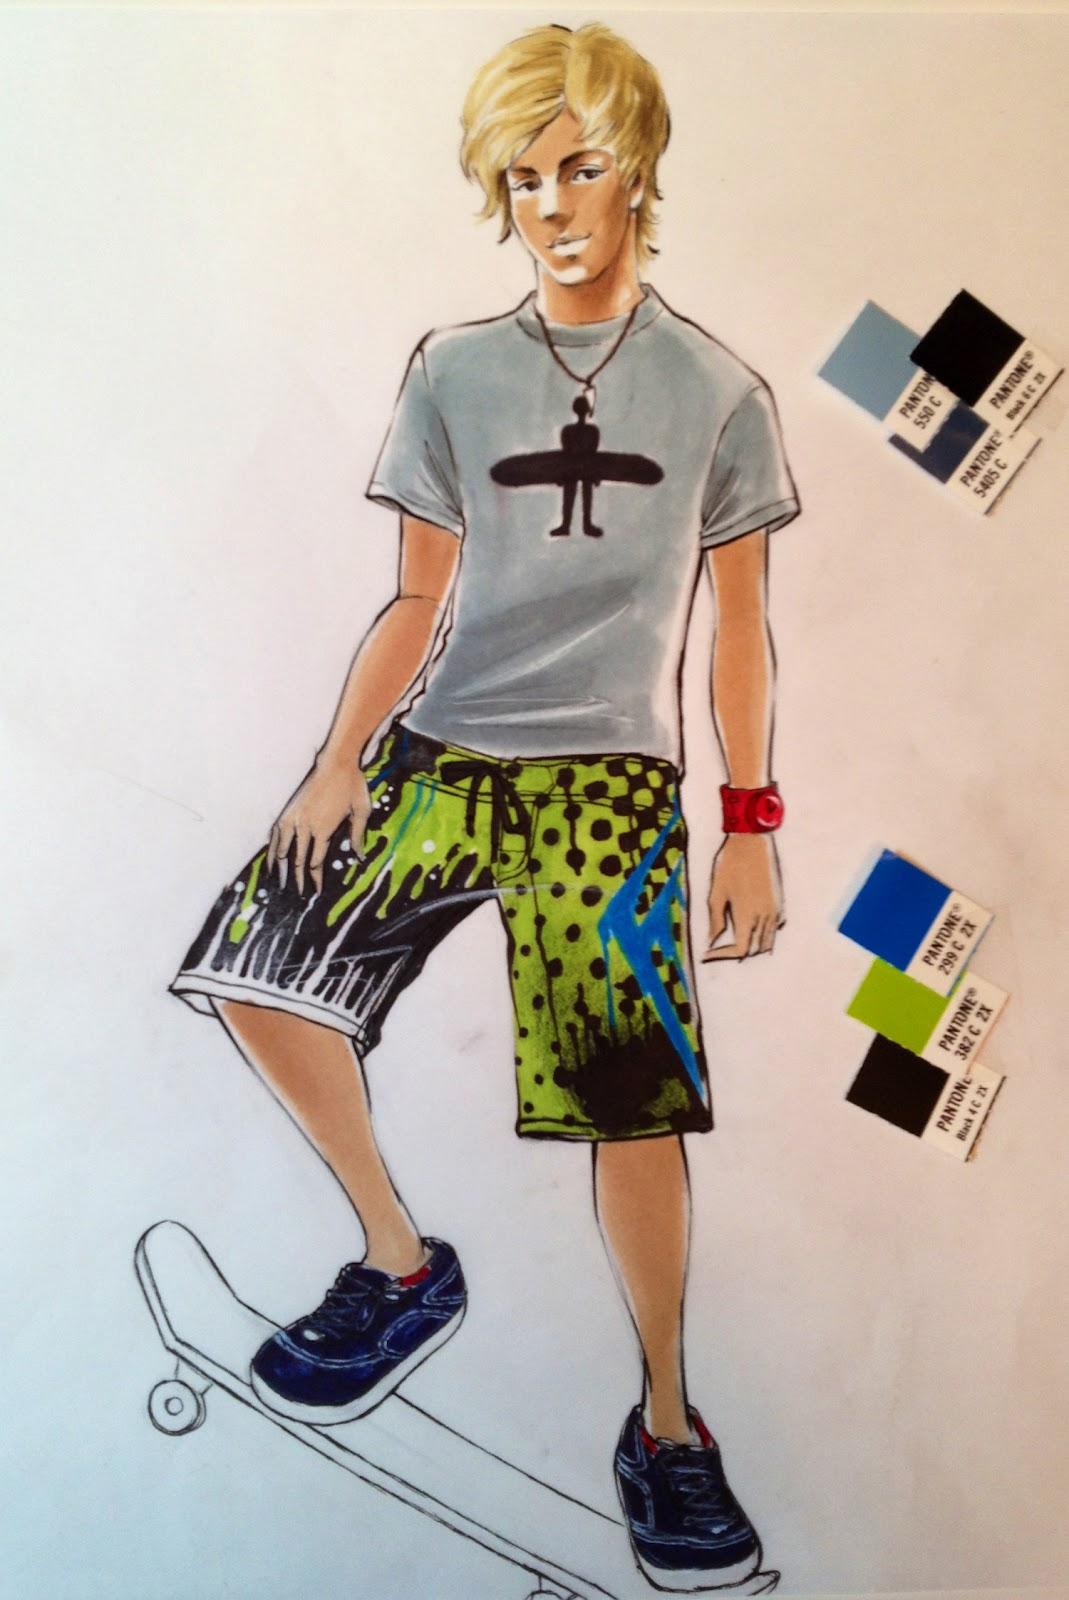 Costume designer ruth carter costume illustrator chloe ji yoon